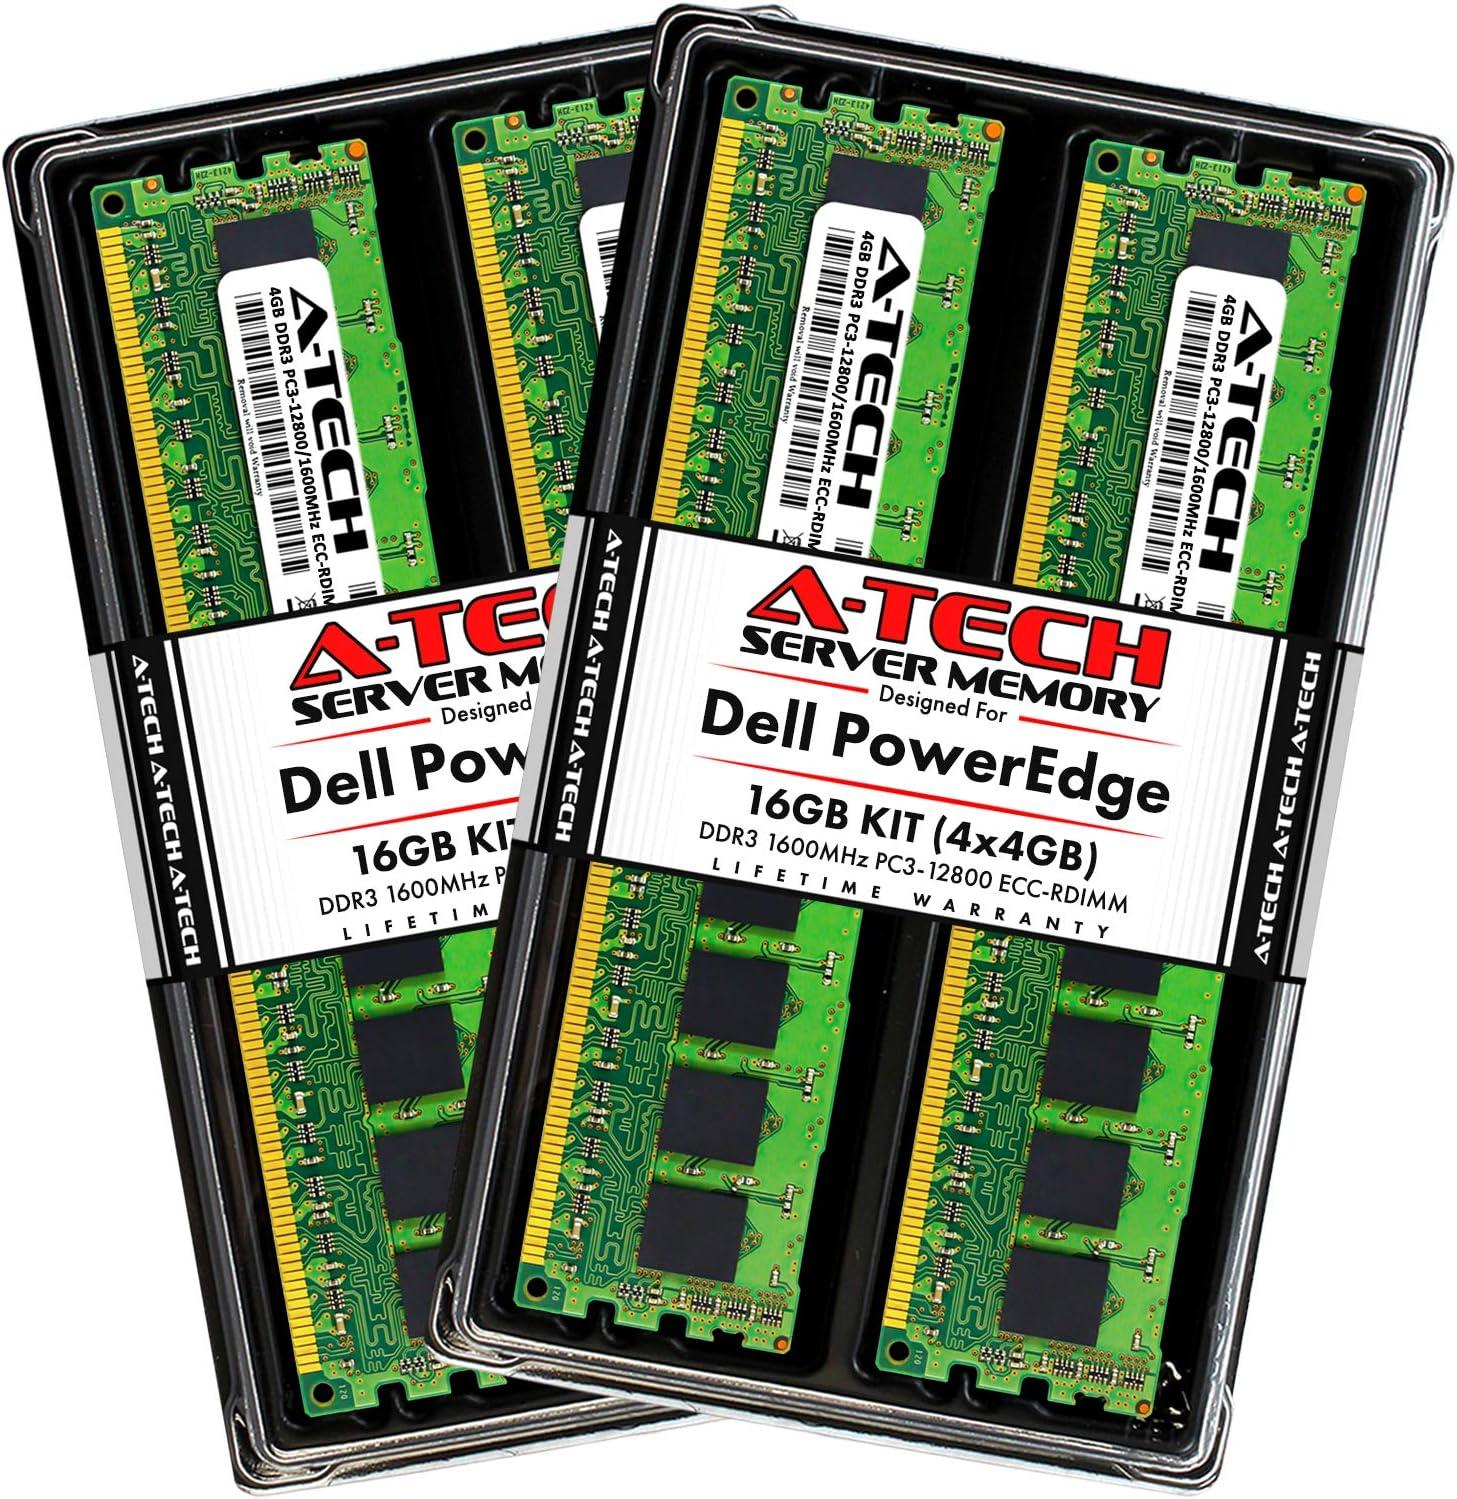 A-Tech 16GB (4x4GB) RAM for Dell PowerEdge R320, R420, R420XR, R520, R620, R720, R720XD, R820, R920 | DDR3 1600MHz ECC-RDIMM PC3-12800 1Rx4 1.5V ECC Registered DIMM Server Memory Upgrade Kit